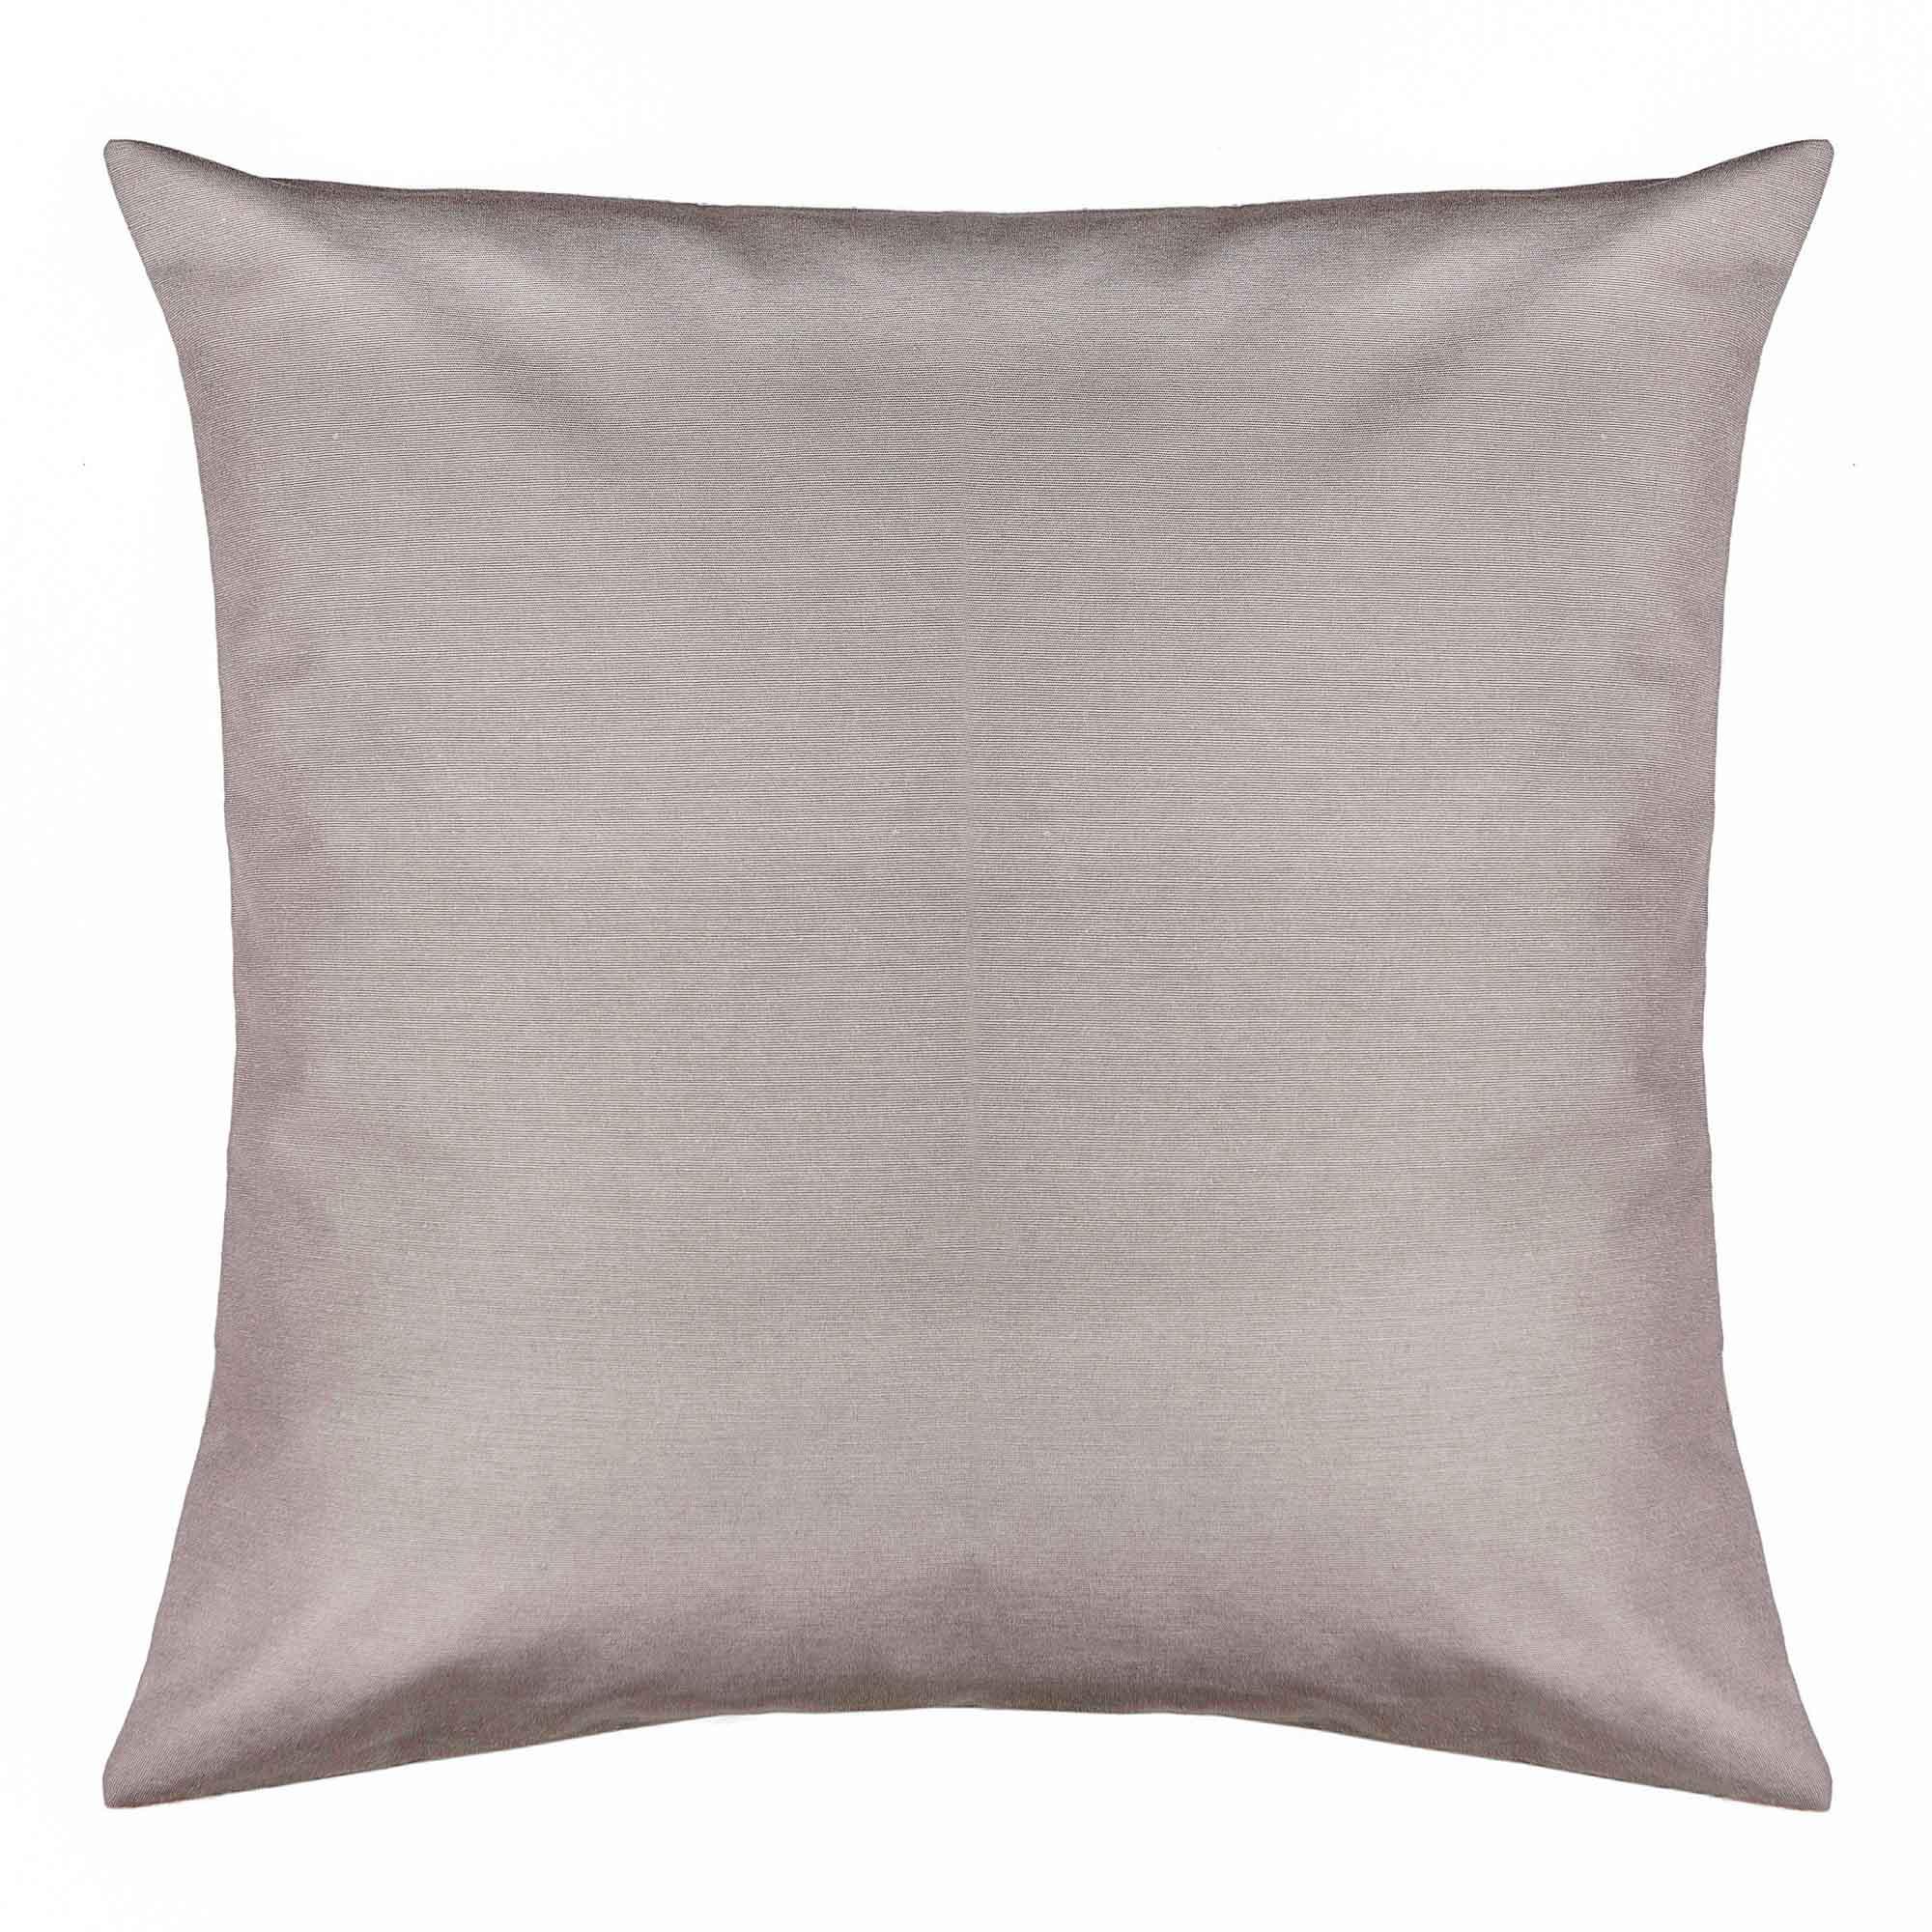 Capa para almofada santista madri 45 x 45 cm 81% algodao 19% poliester cinza